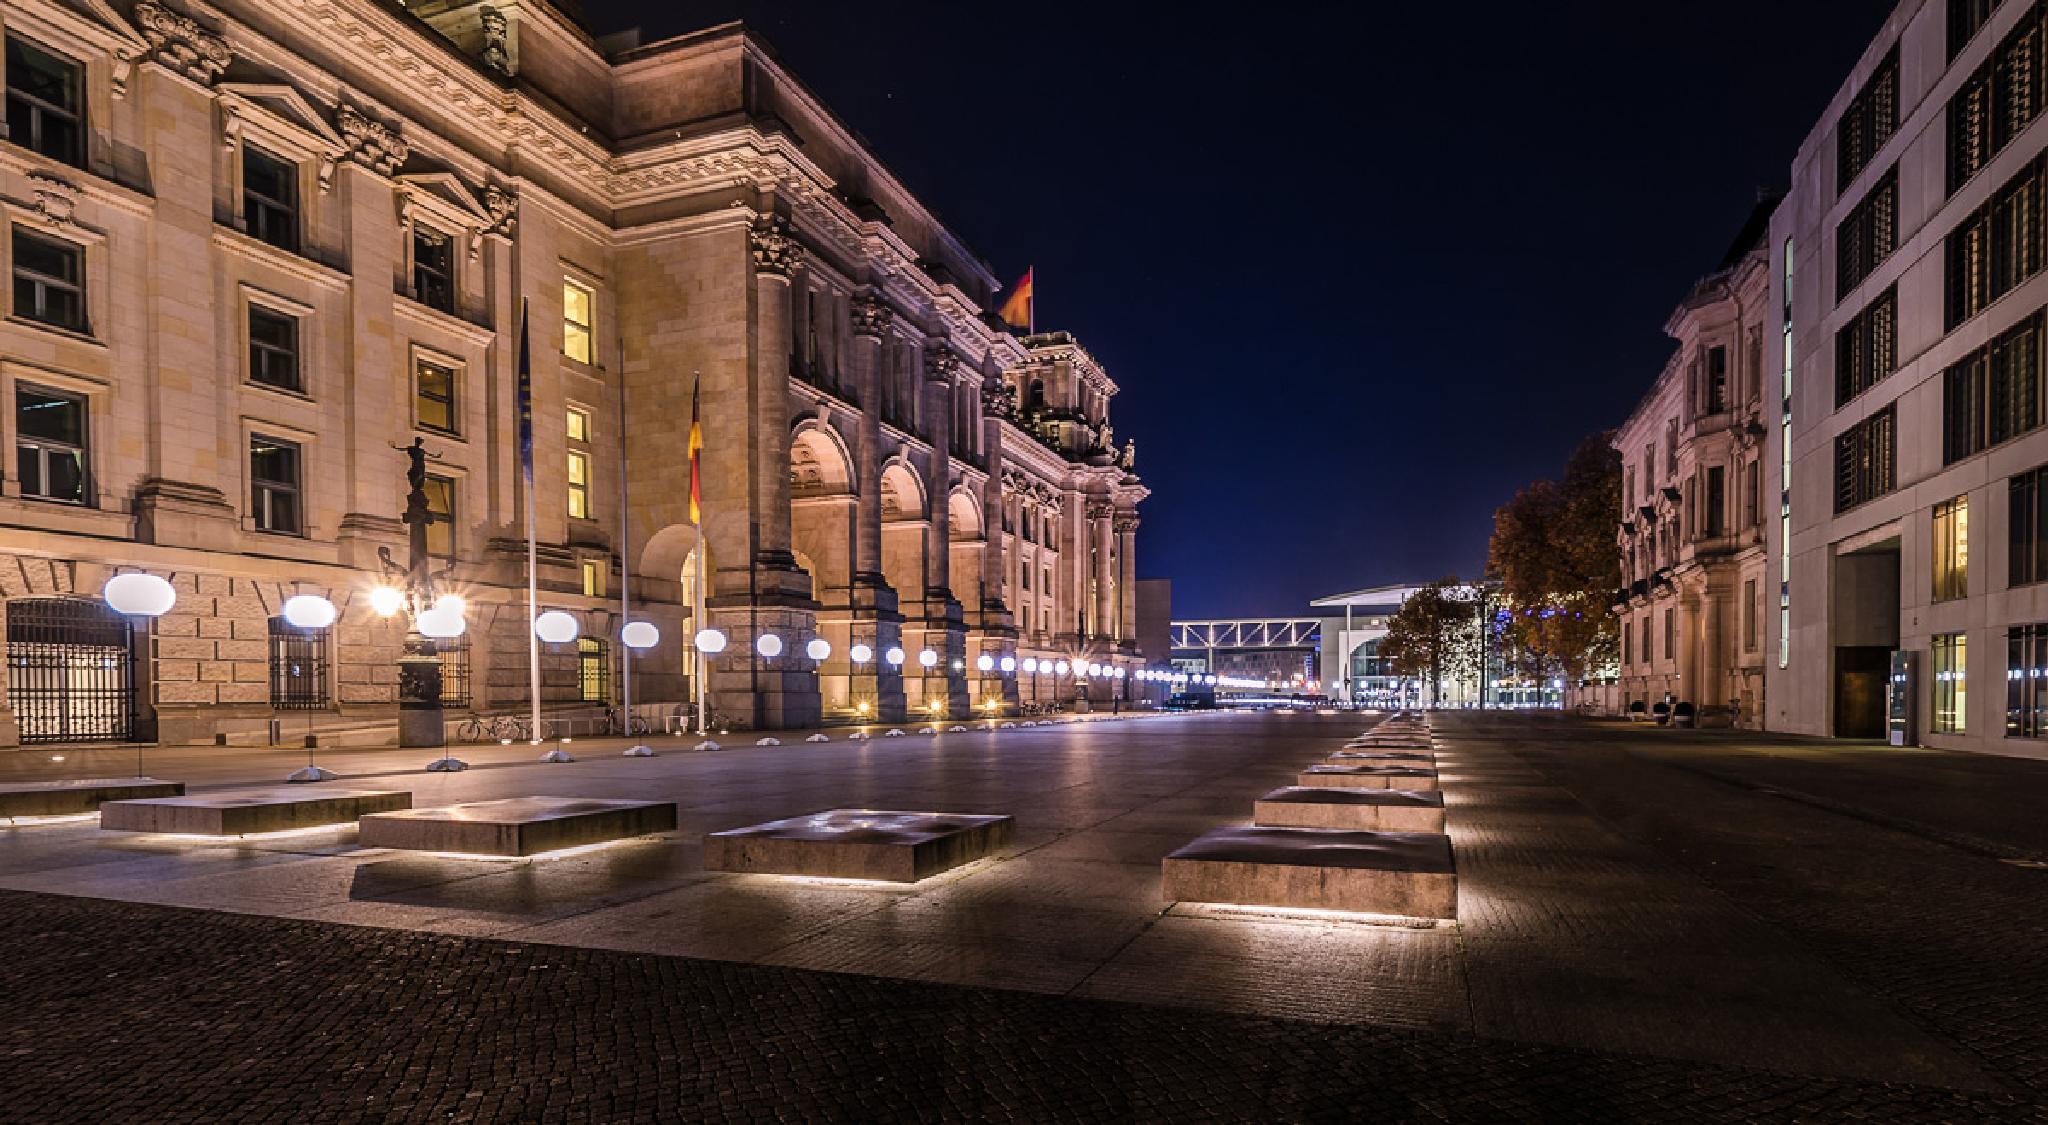 Berlin - 09. November 2014 by ThomasBechtleFotografie